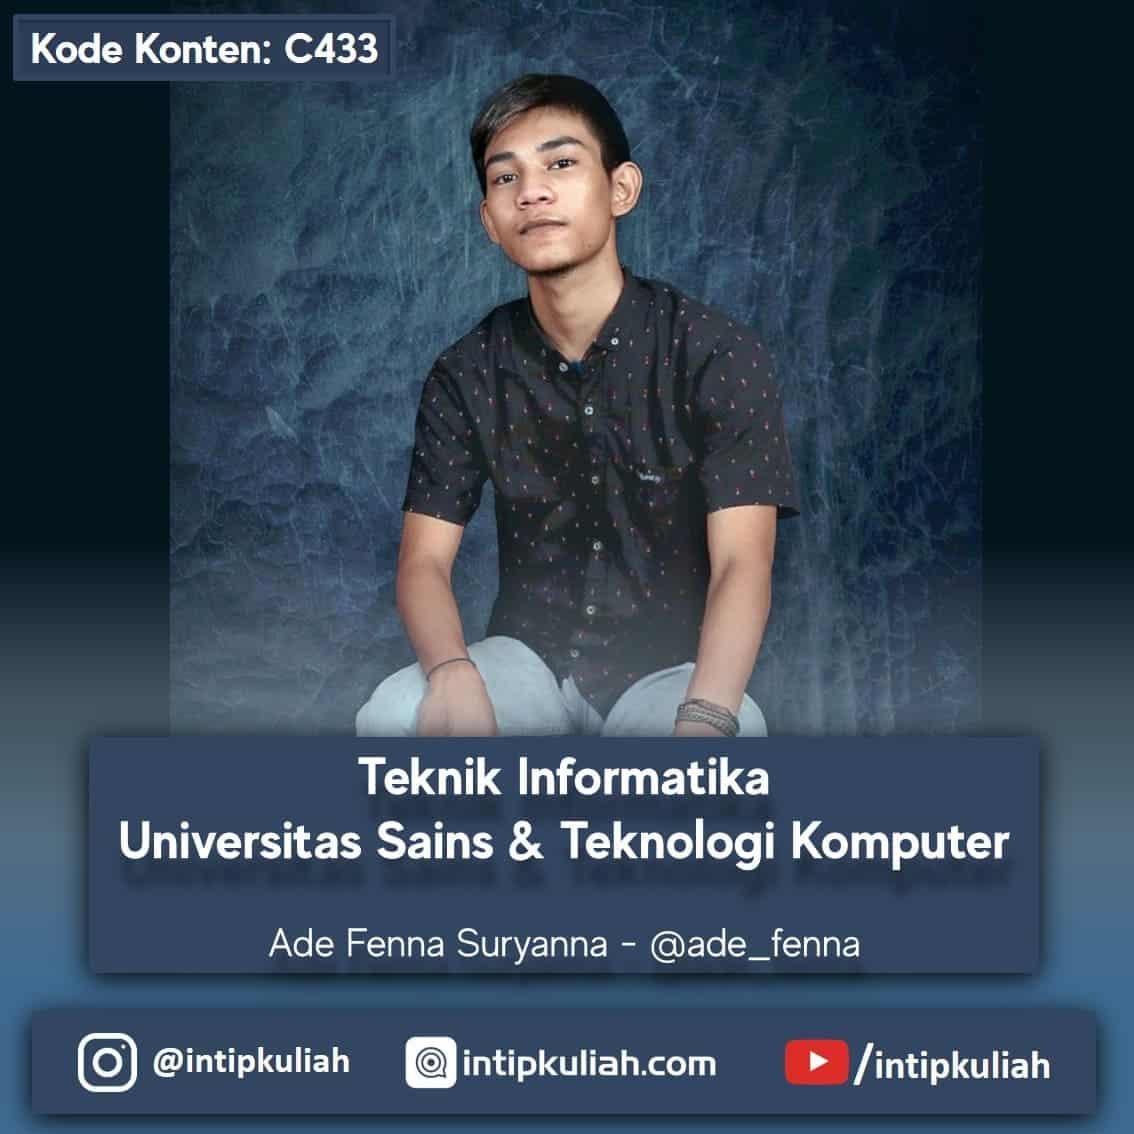 Teknik Informatika Universitas Sains & Teknologi Komputer (Ade)